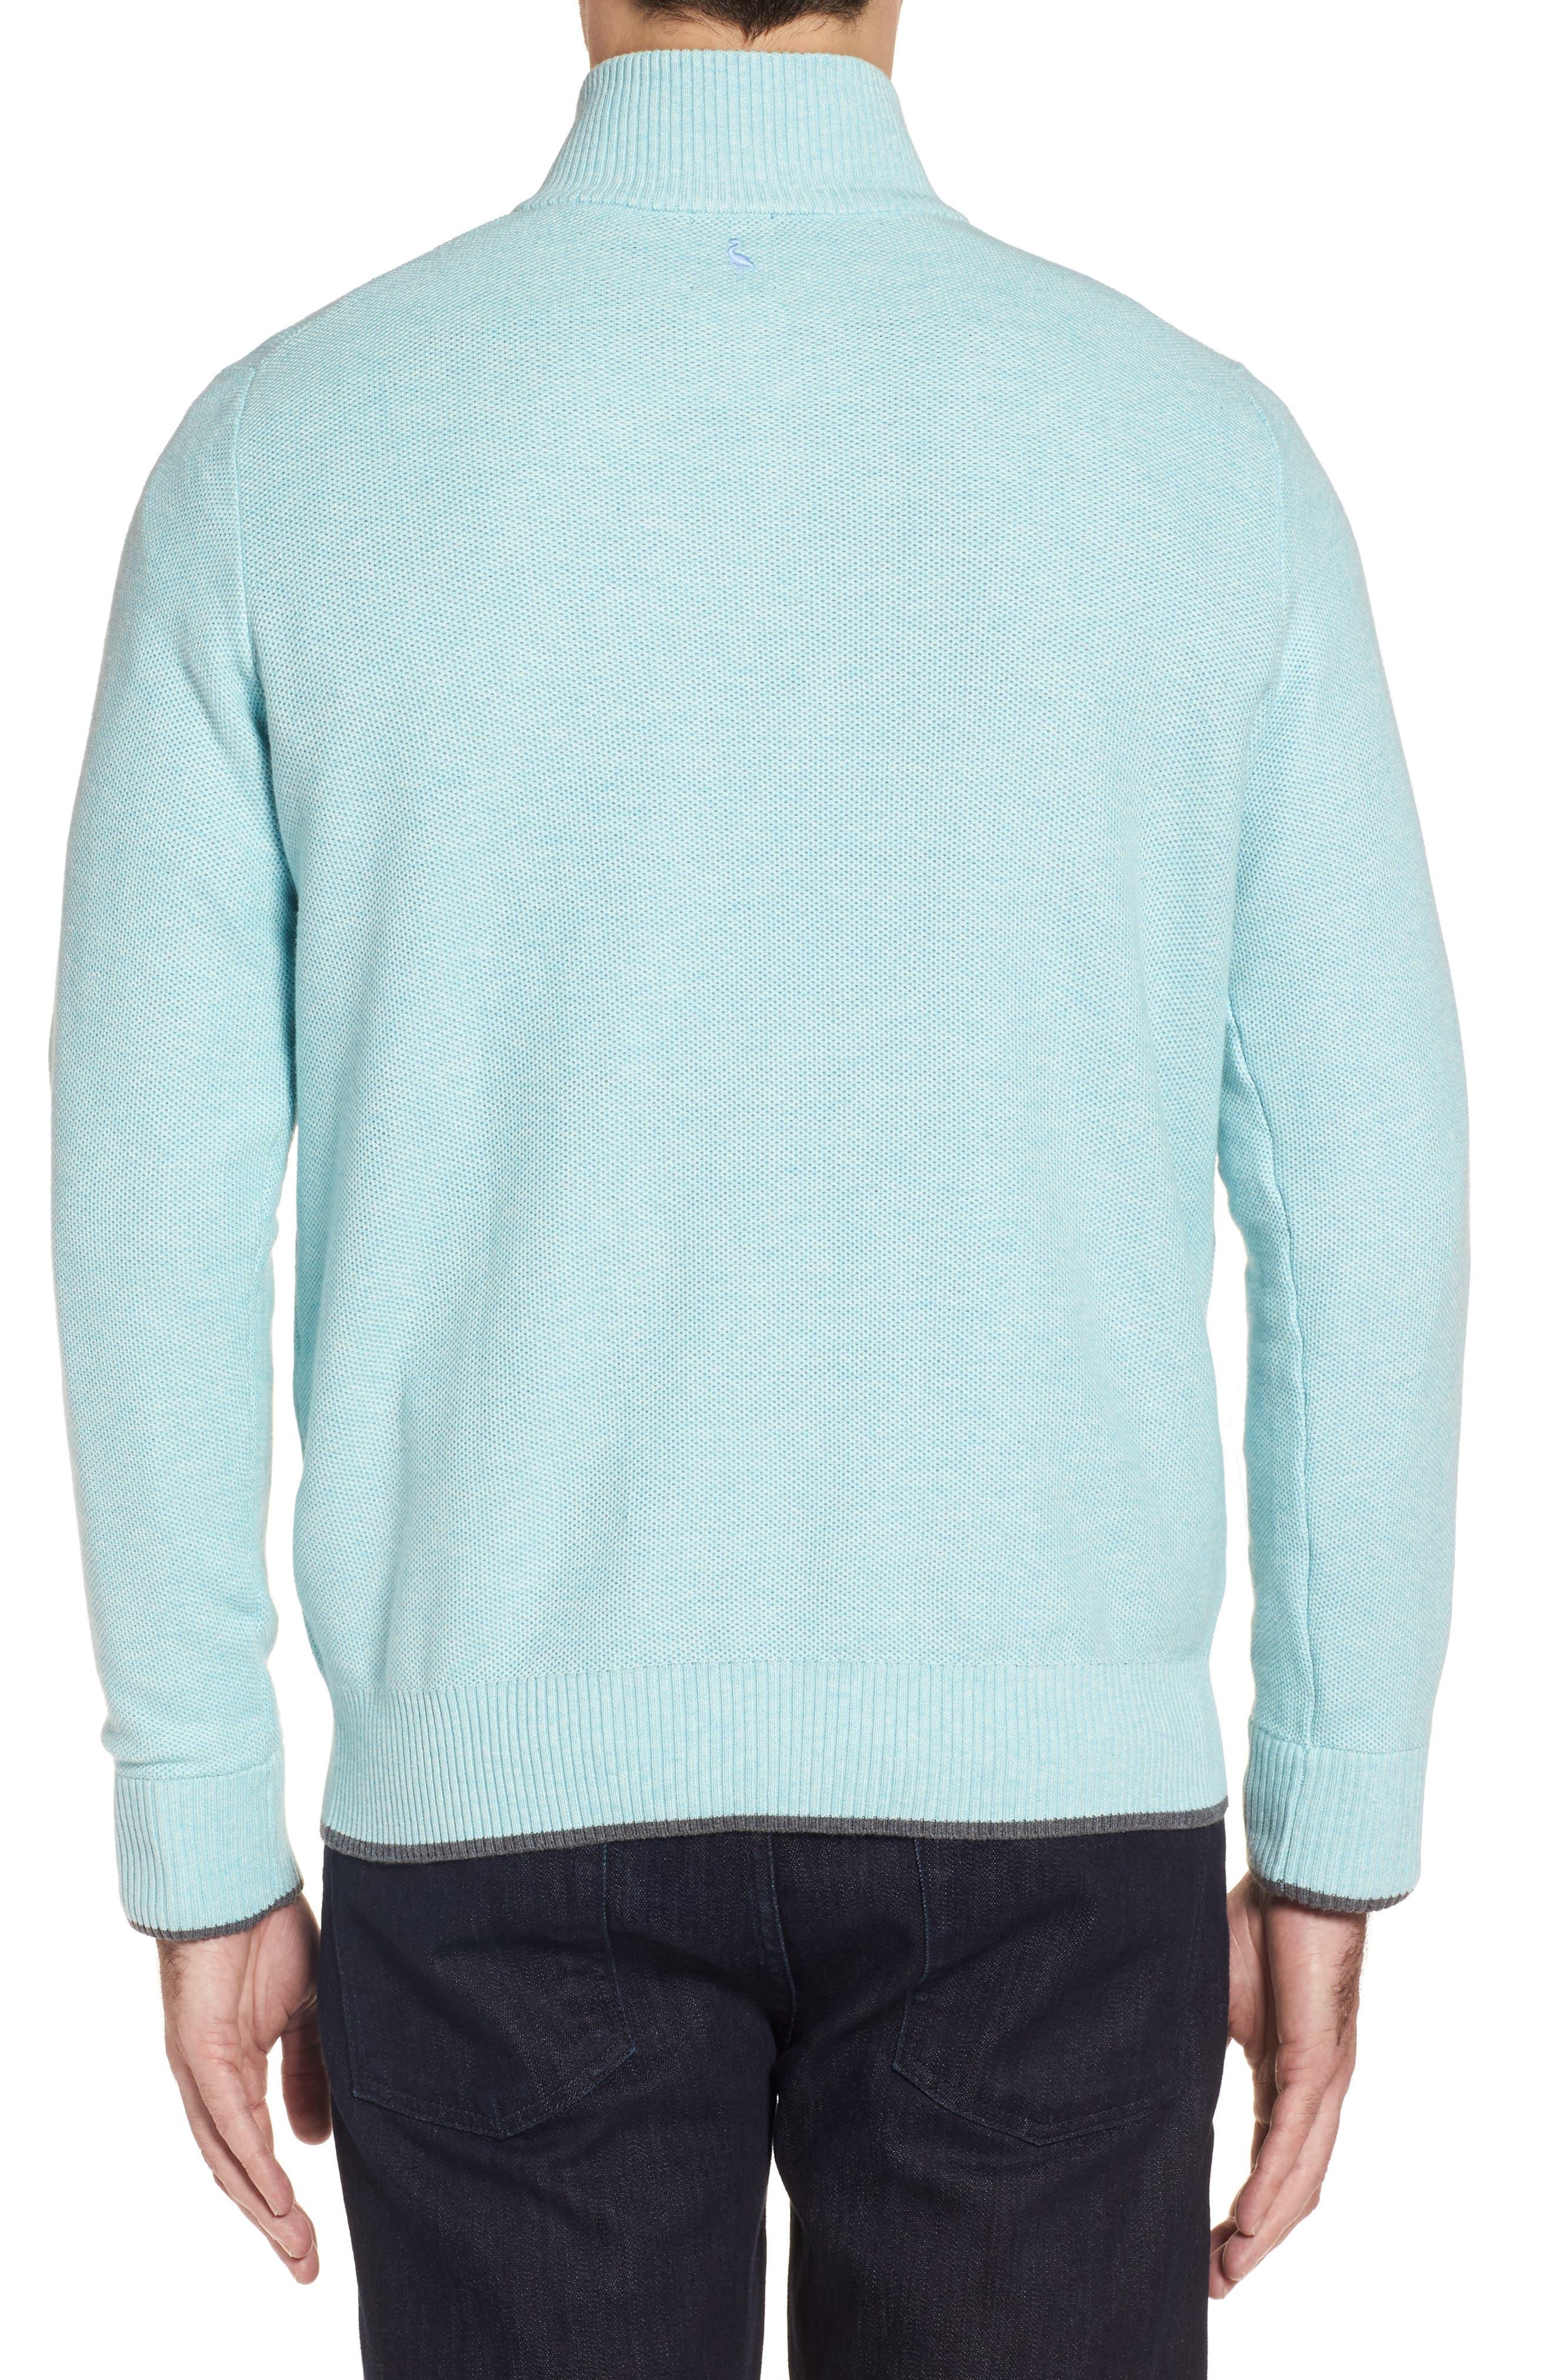 Starks Tipped Quarter Zip Sweater,                             Alternate thumbnail 2, color,                             Aqua